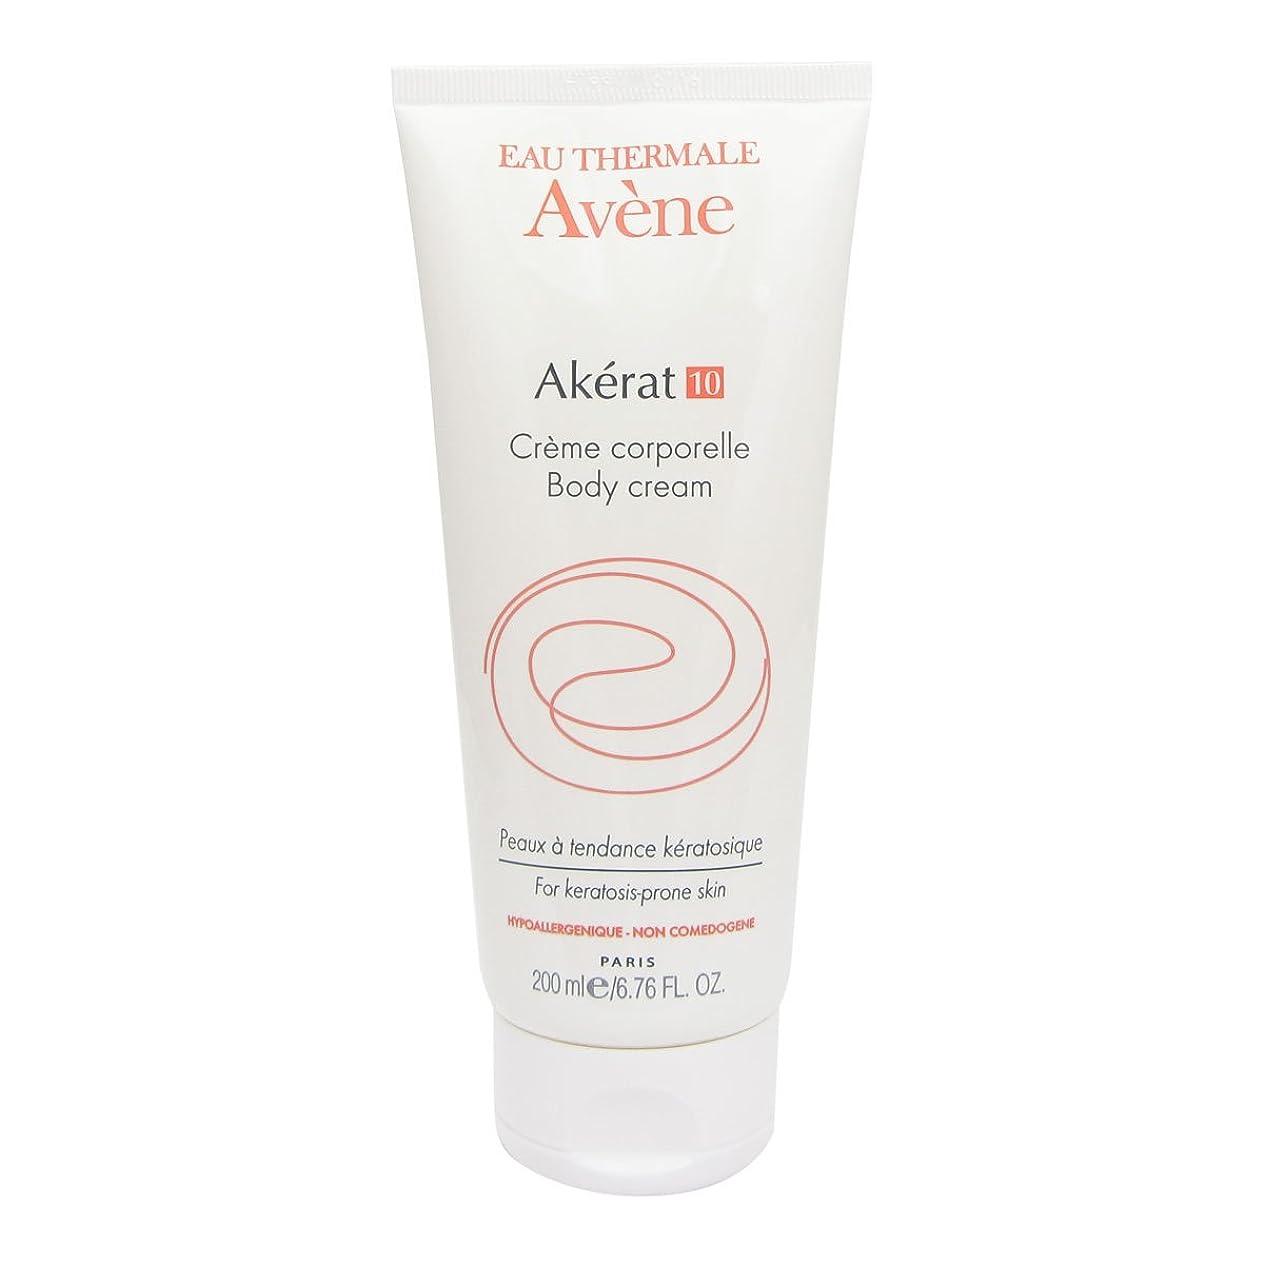 ケーブル群衆正気Avene Akerat 10 Body Cream 200ml [並行輸入品]